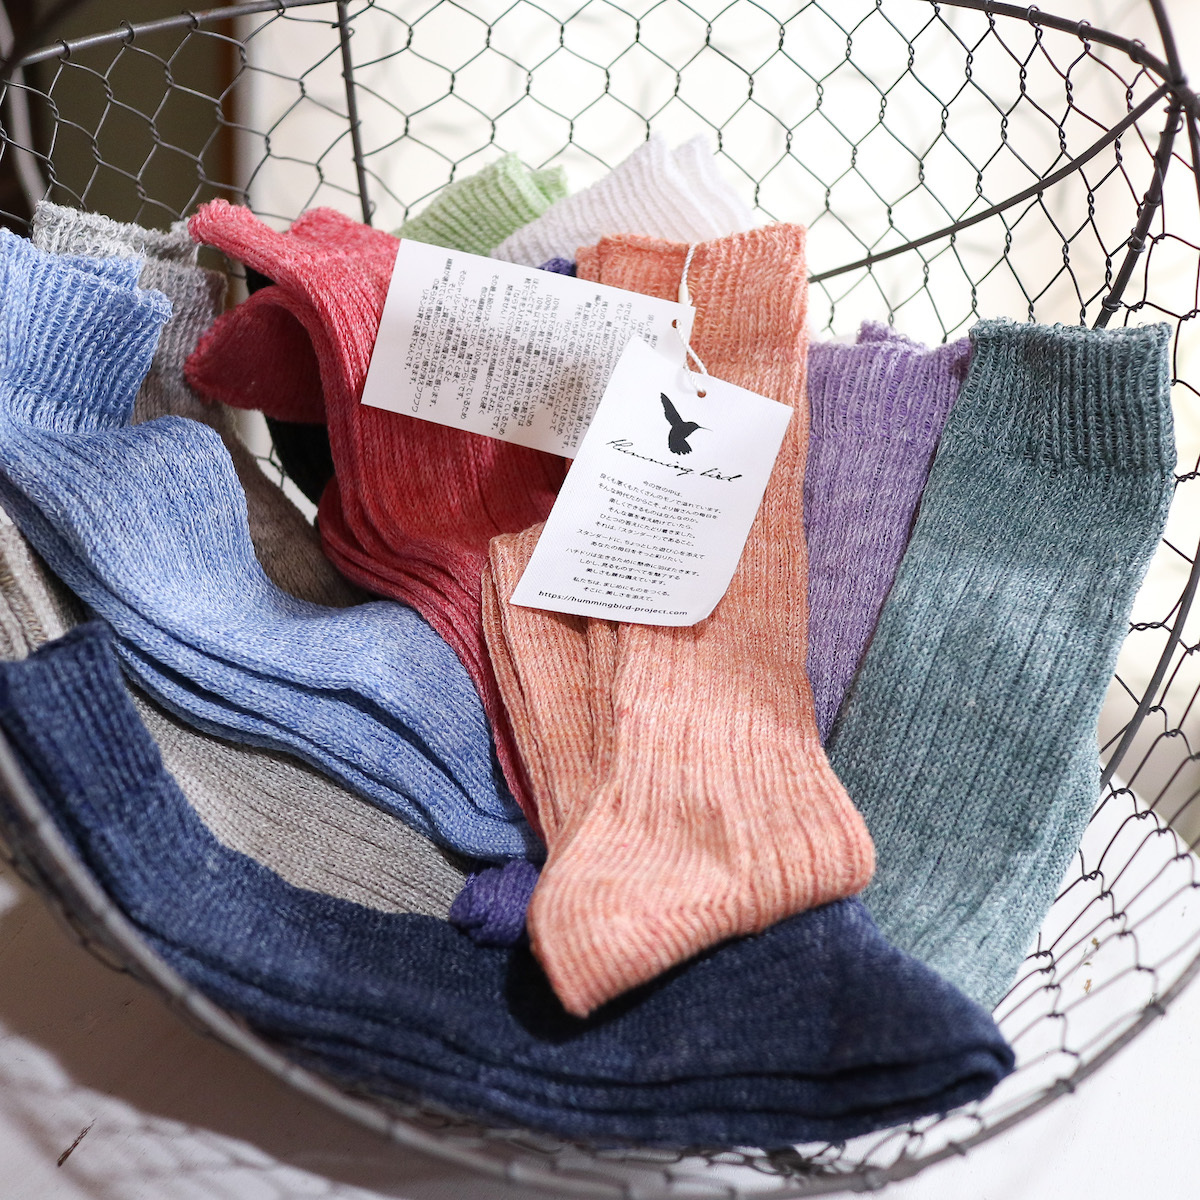 Hummingbird 日本製靴下 リネンゆるハイソックス Mサイズ レディース 22〜24cm